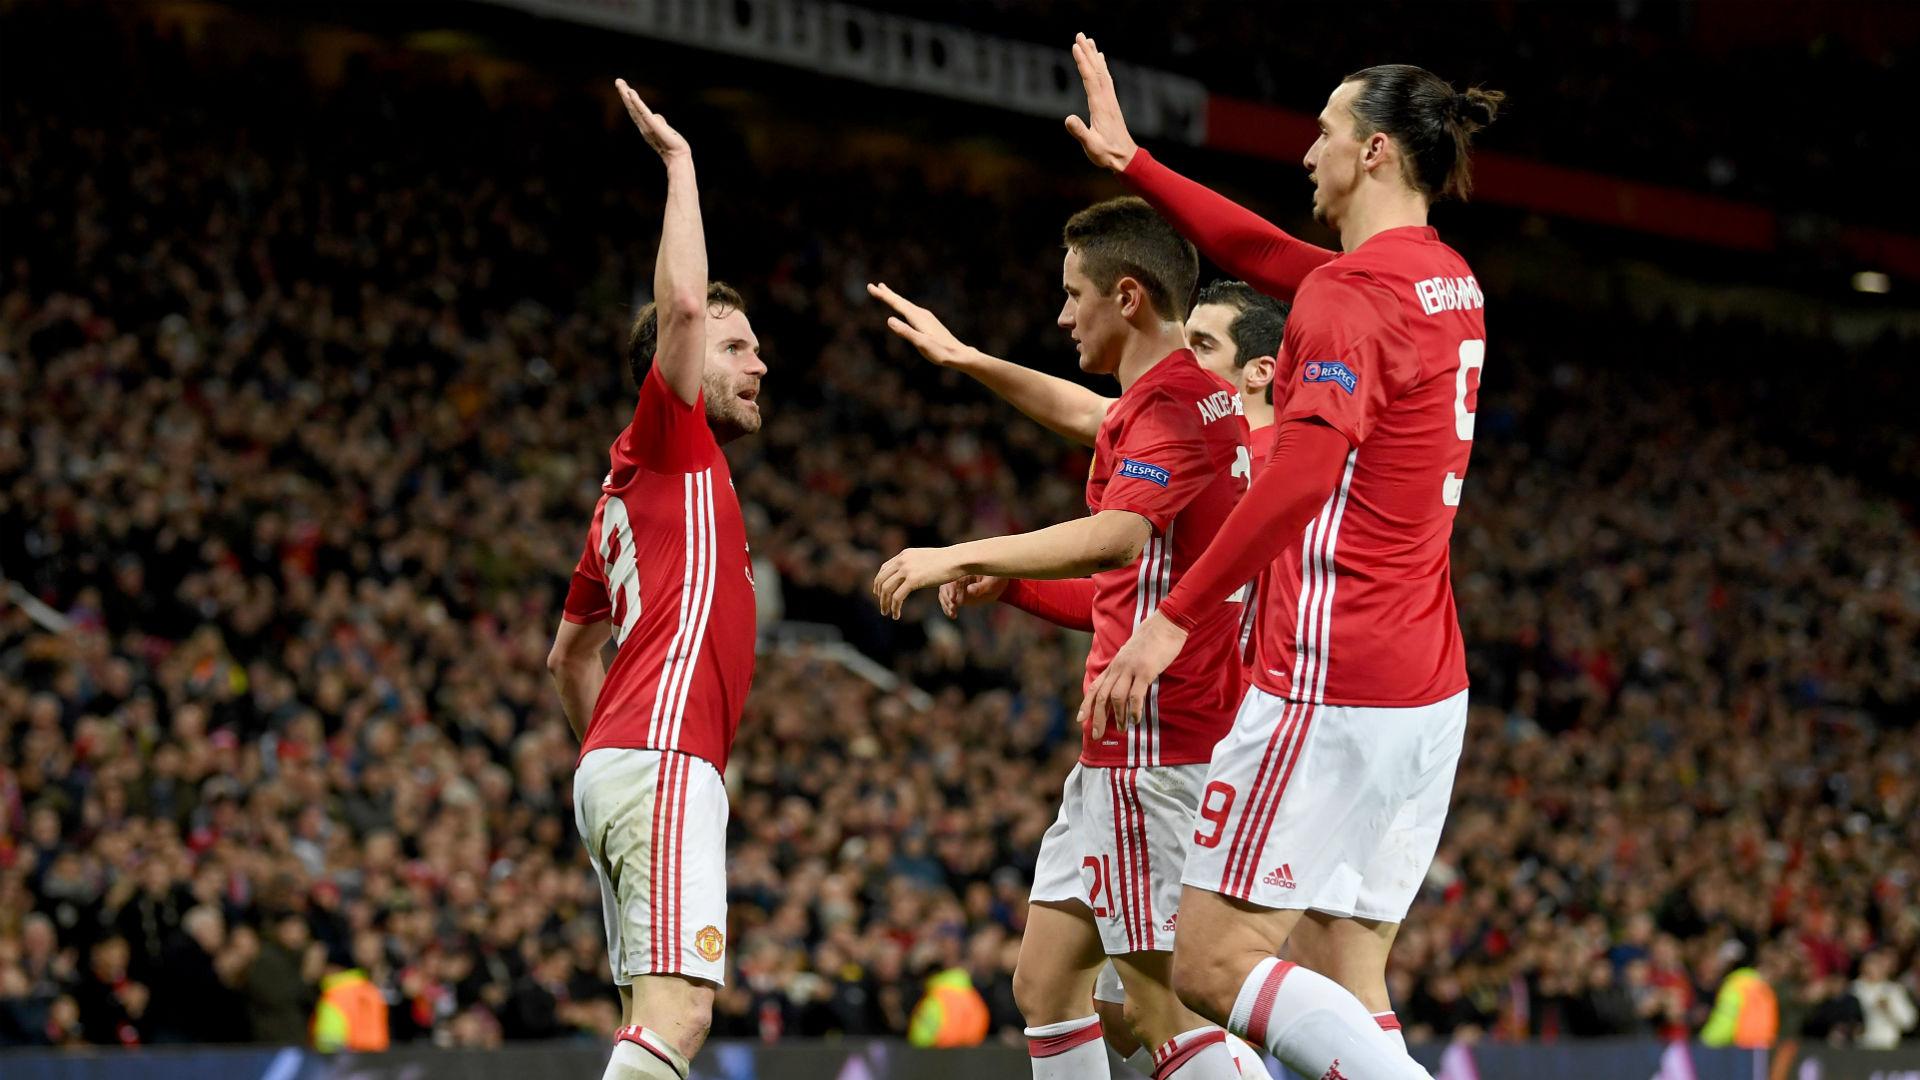 Manchester United cumplió y avanzó contra Rostov en Europa League